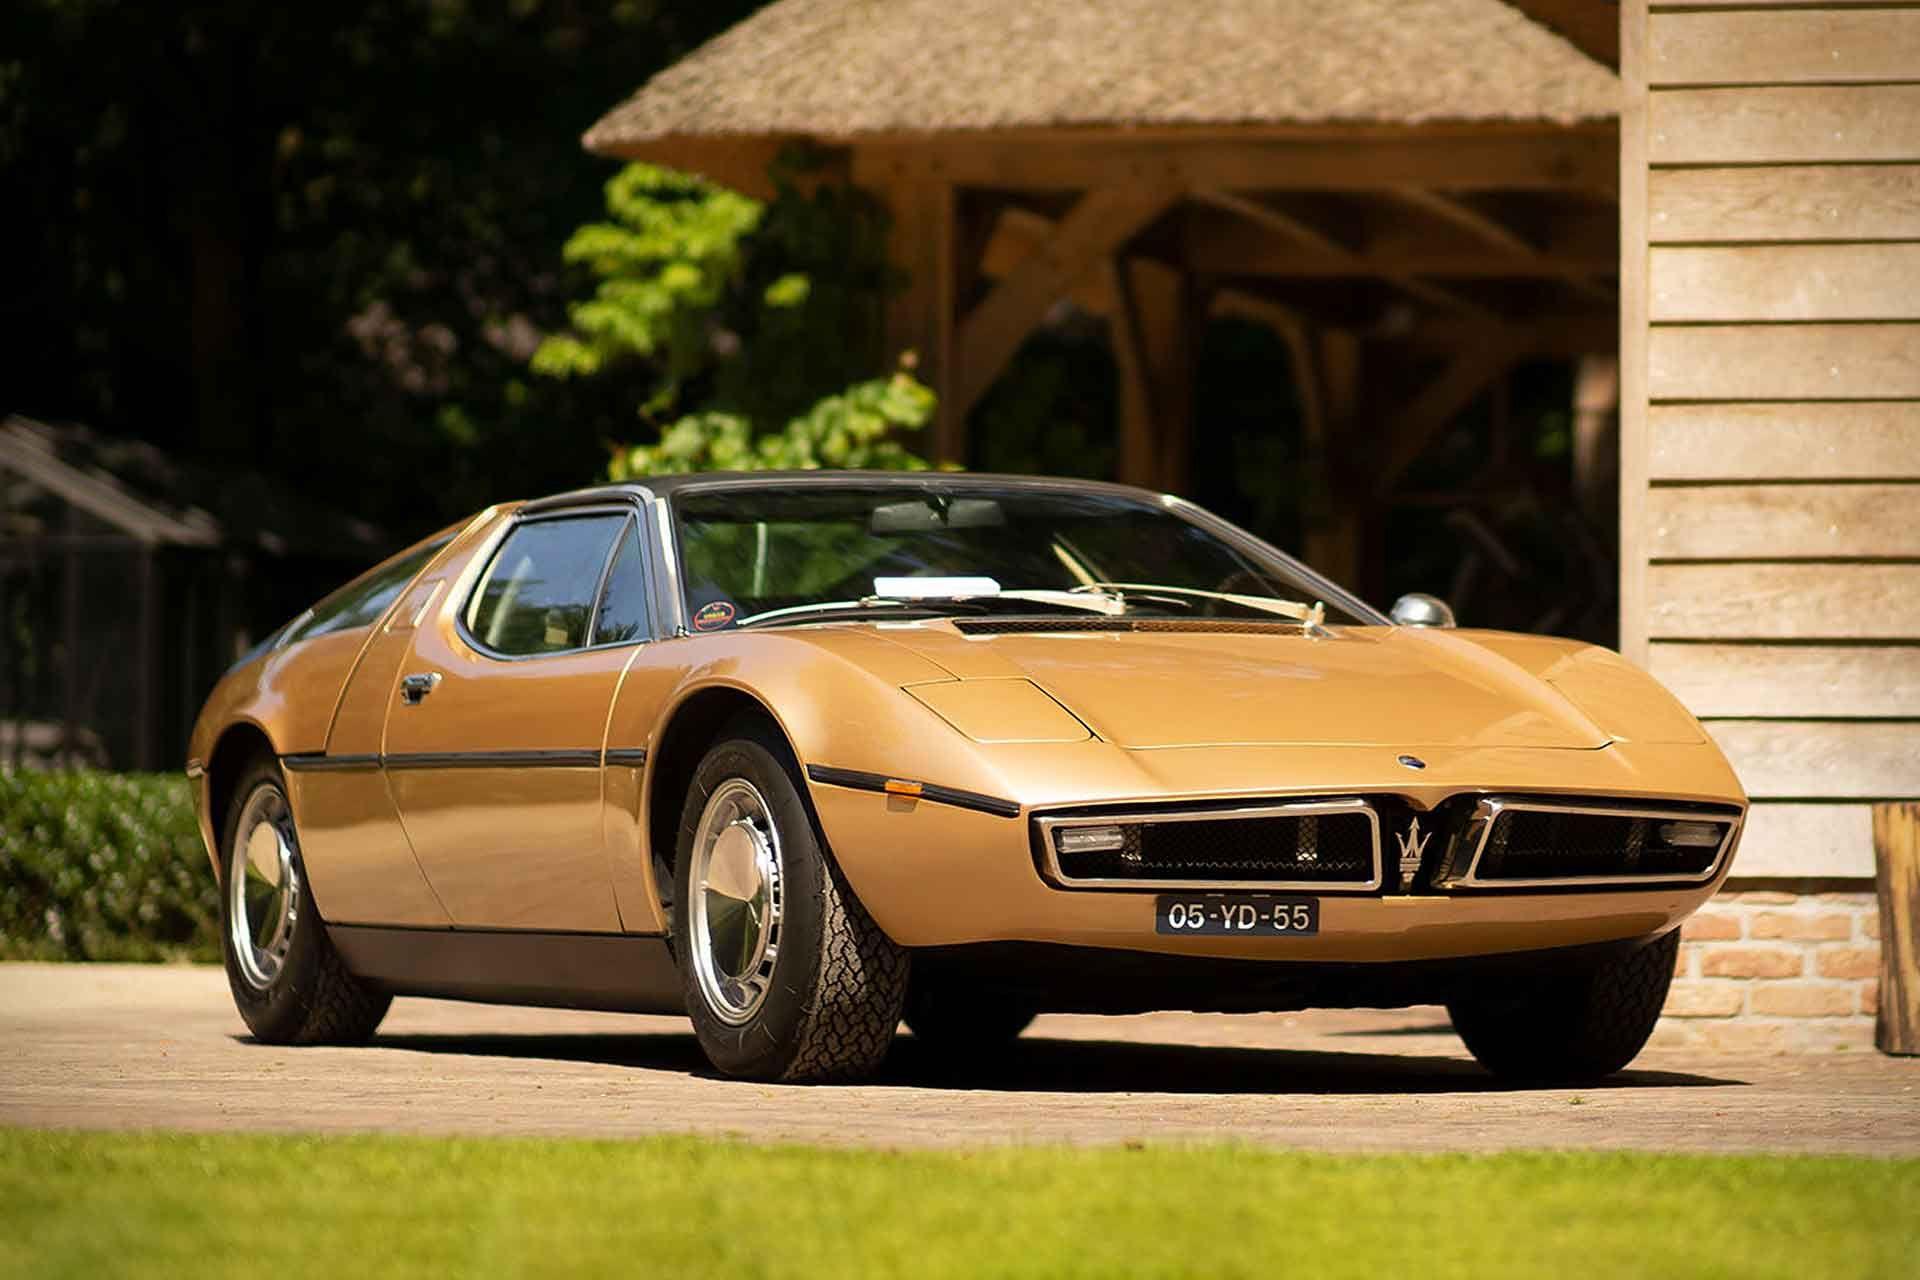 IMG_3096 (1) | Classic european cars, Maserati bora, Maserati